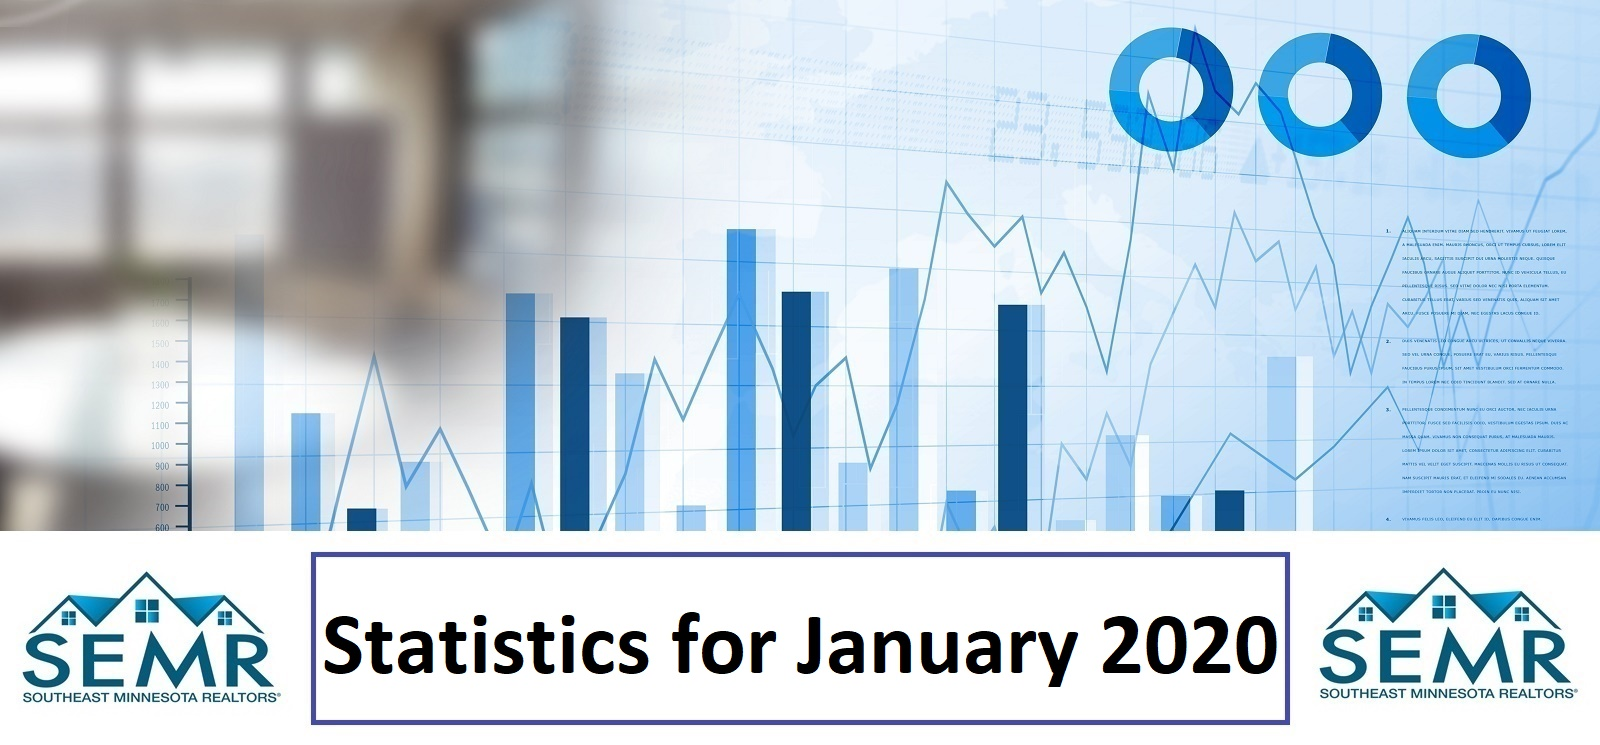 SEMR Statistics for January 2020